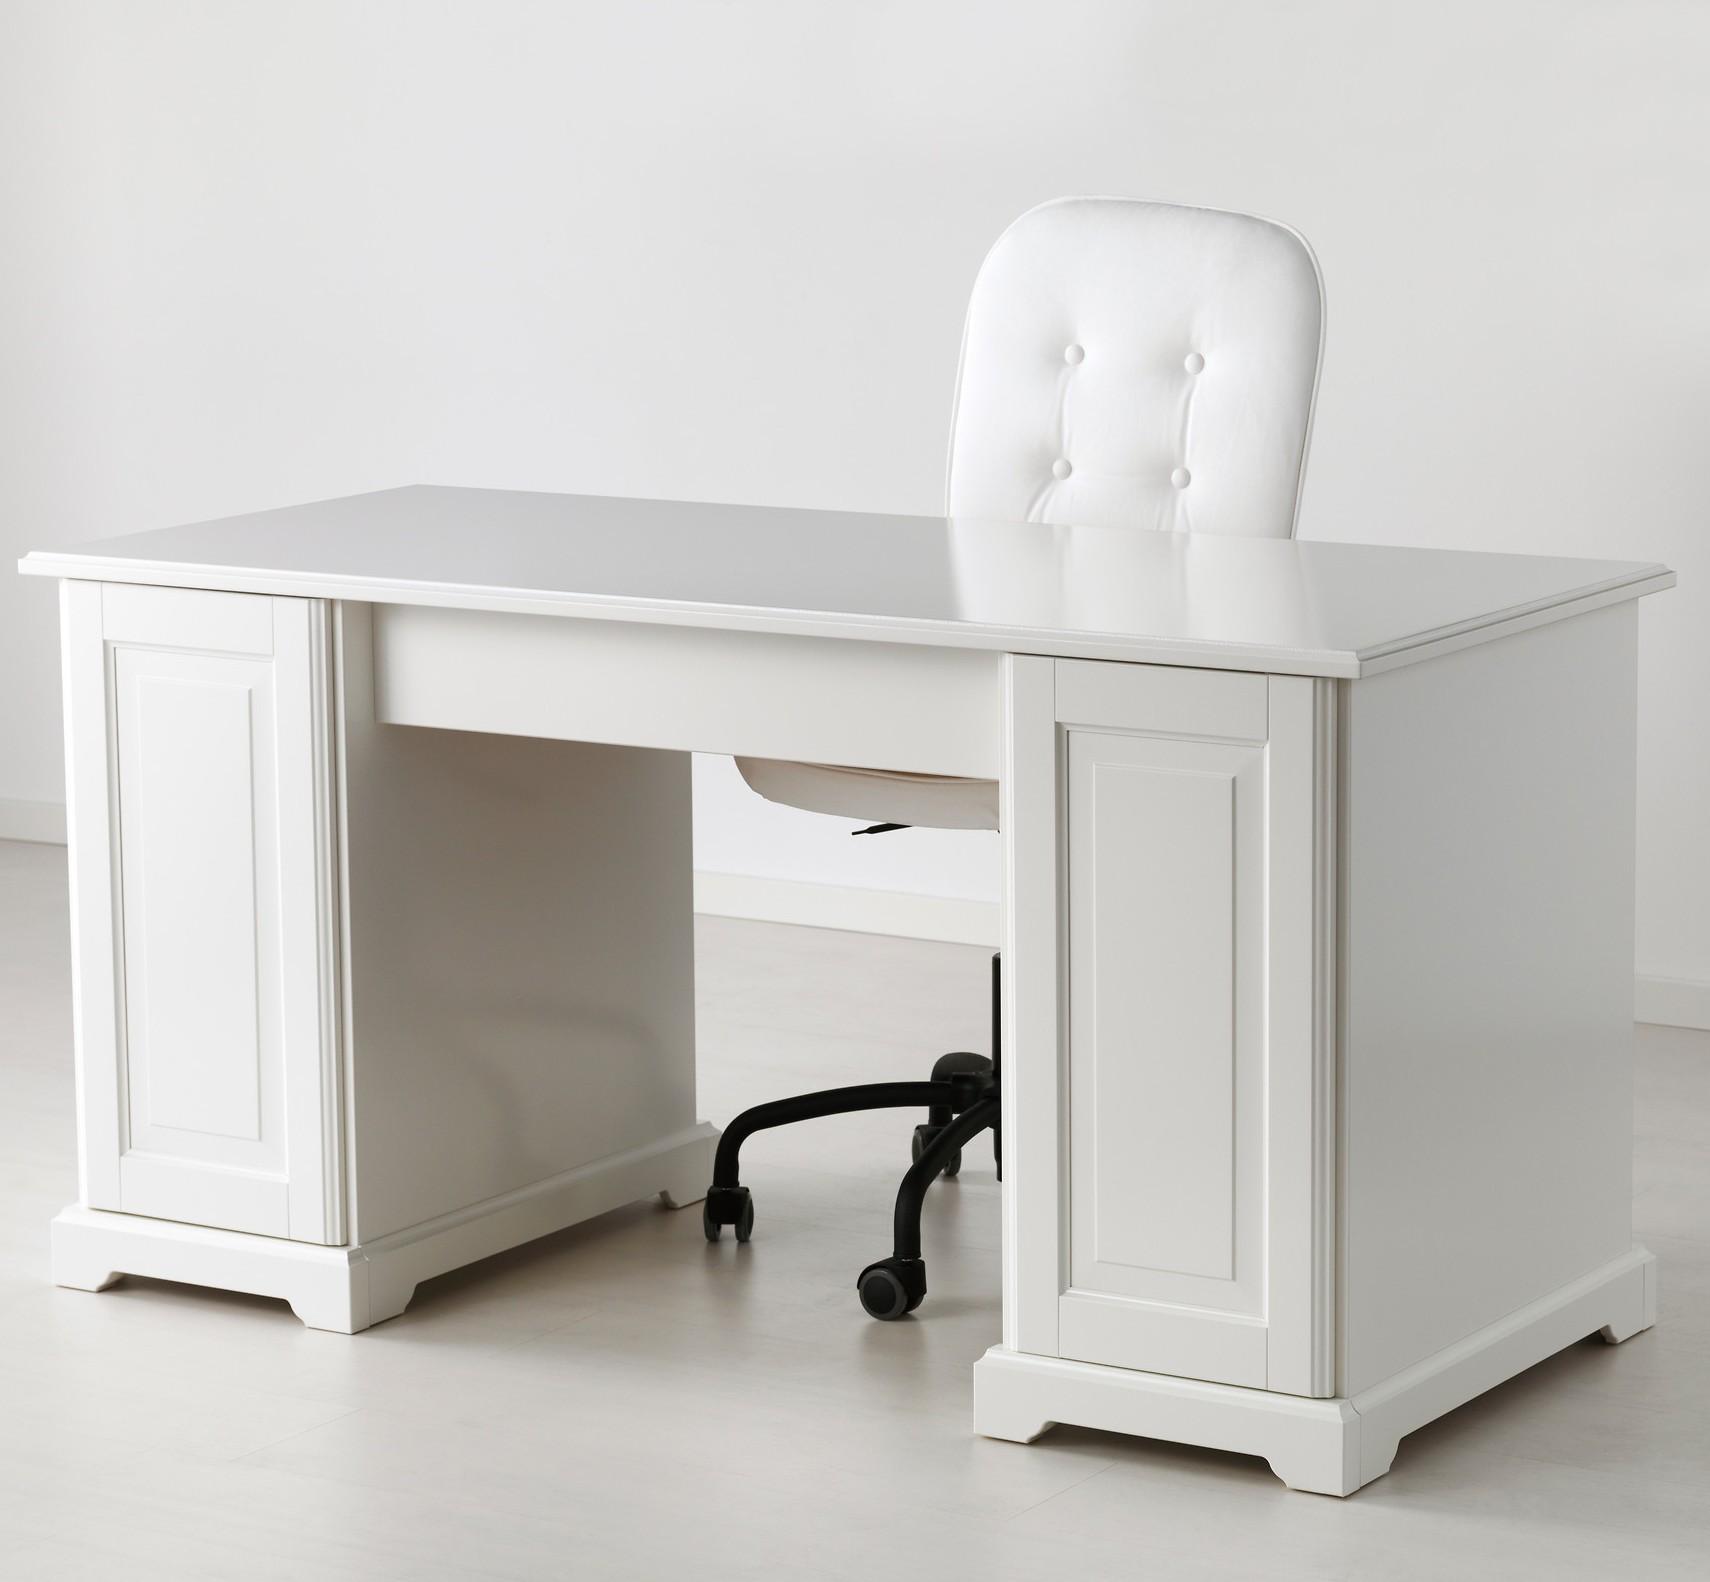 Икеа столы